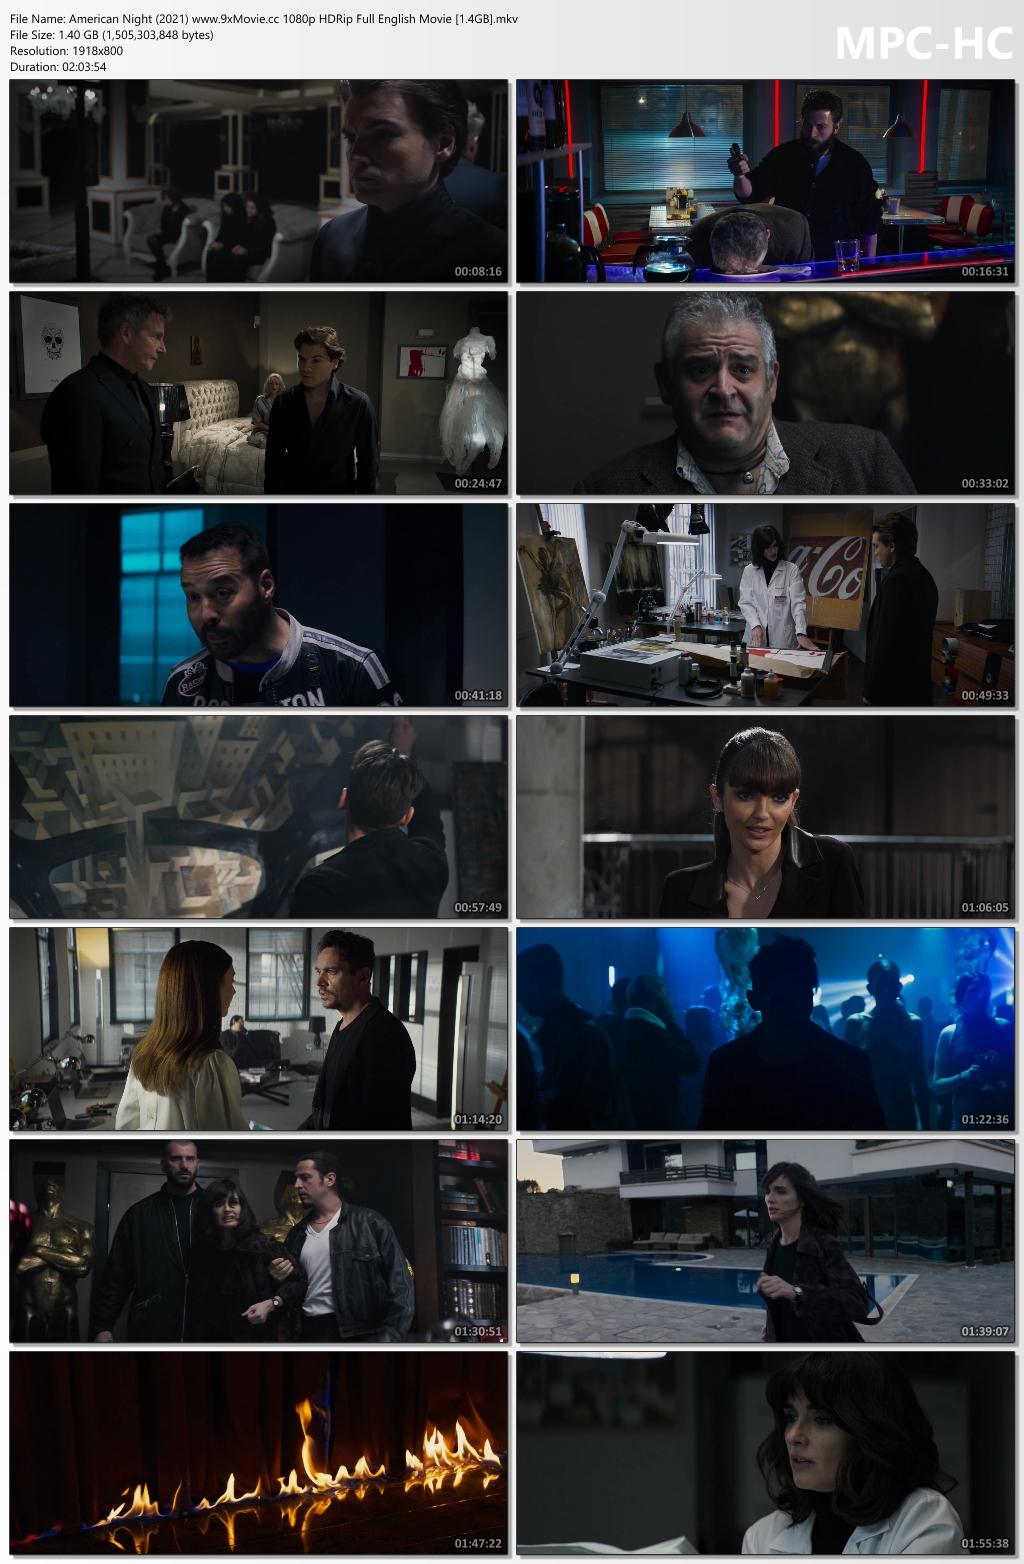 American-Night-2021-www-9x-Movie-cc-1080p-HDRip-Full-English-Movie-1-4-GB-mkv